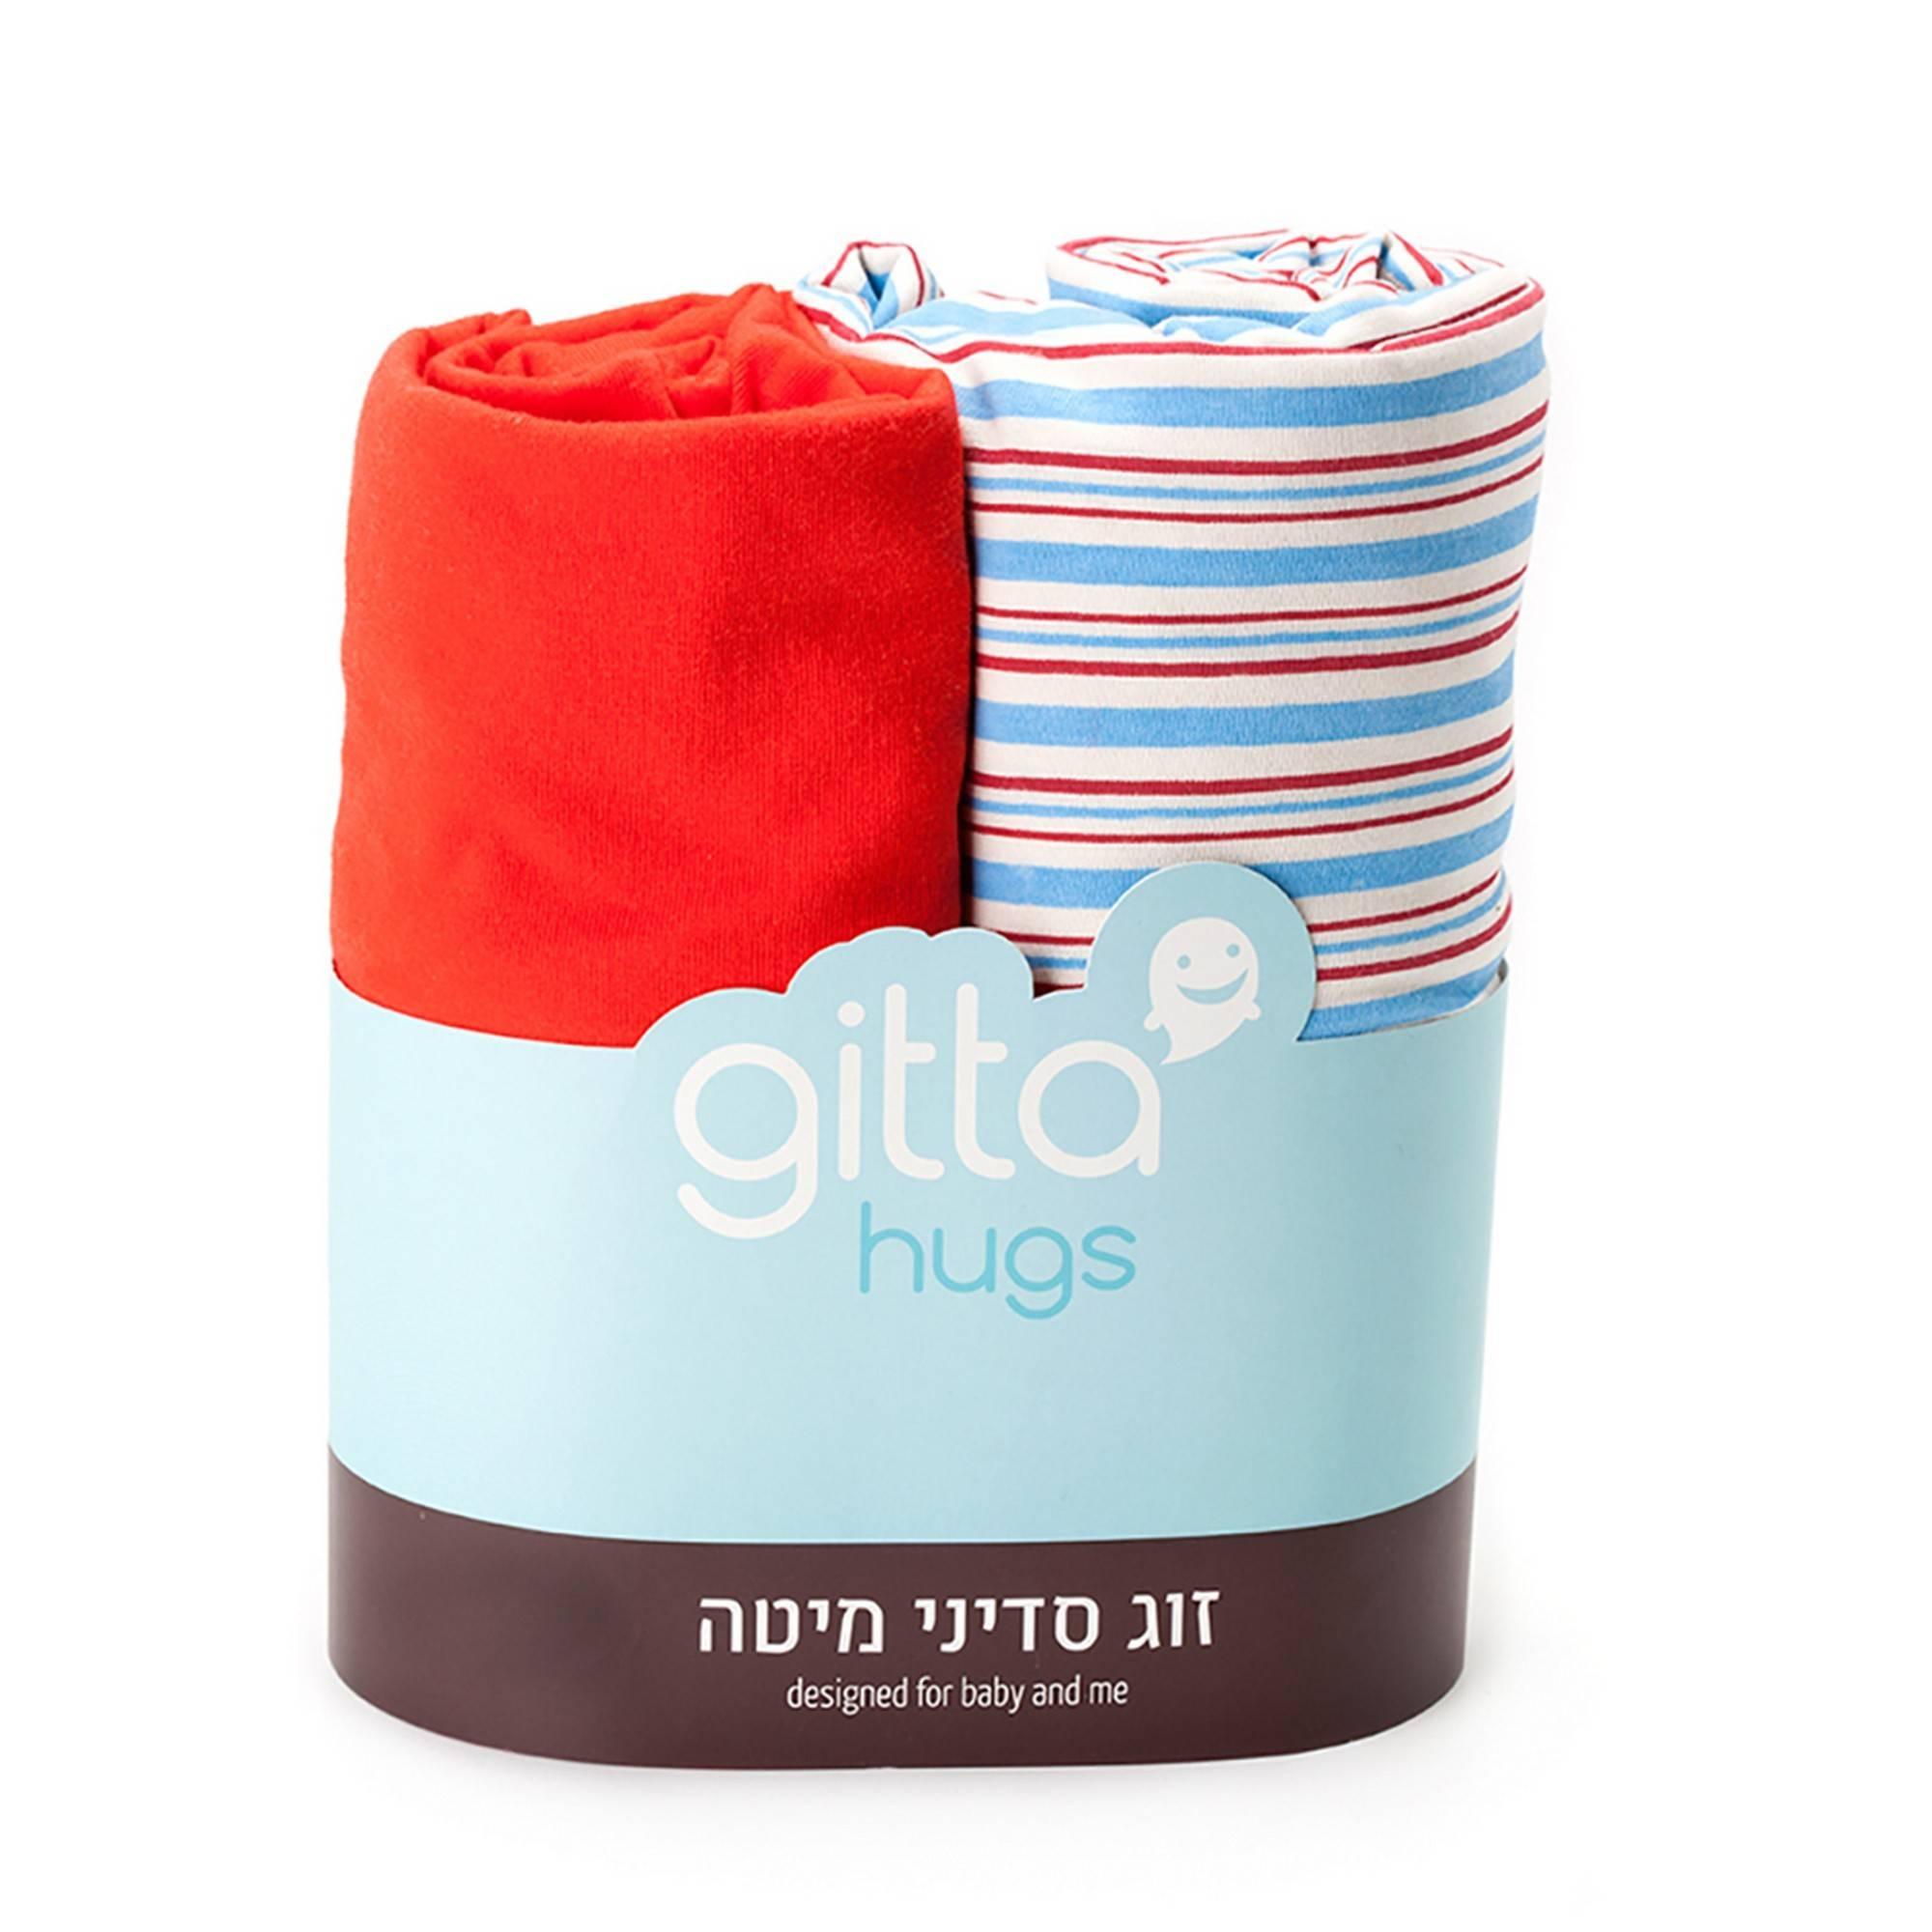 GITTA Cot Sheets - Red Stripes